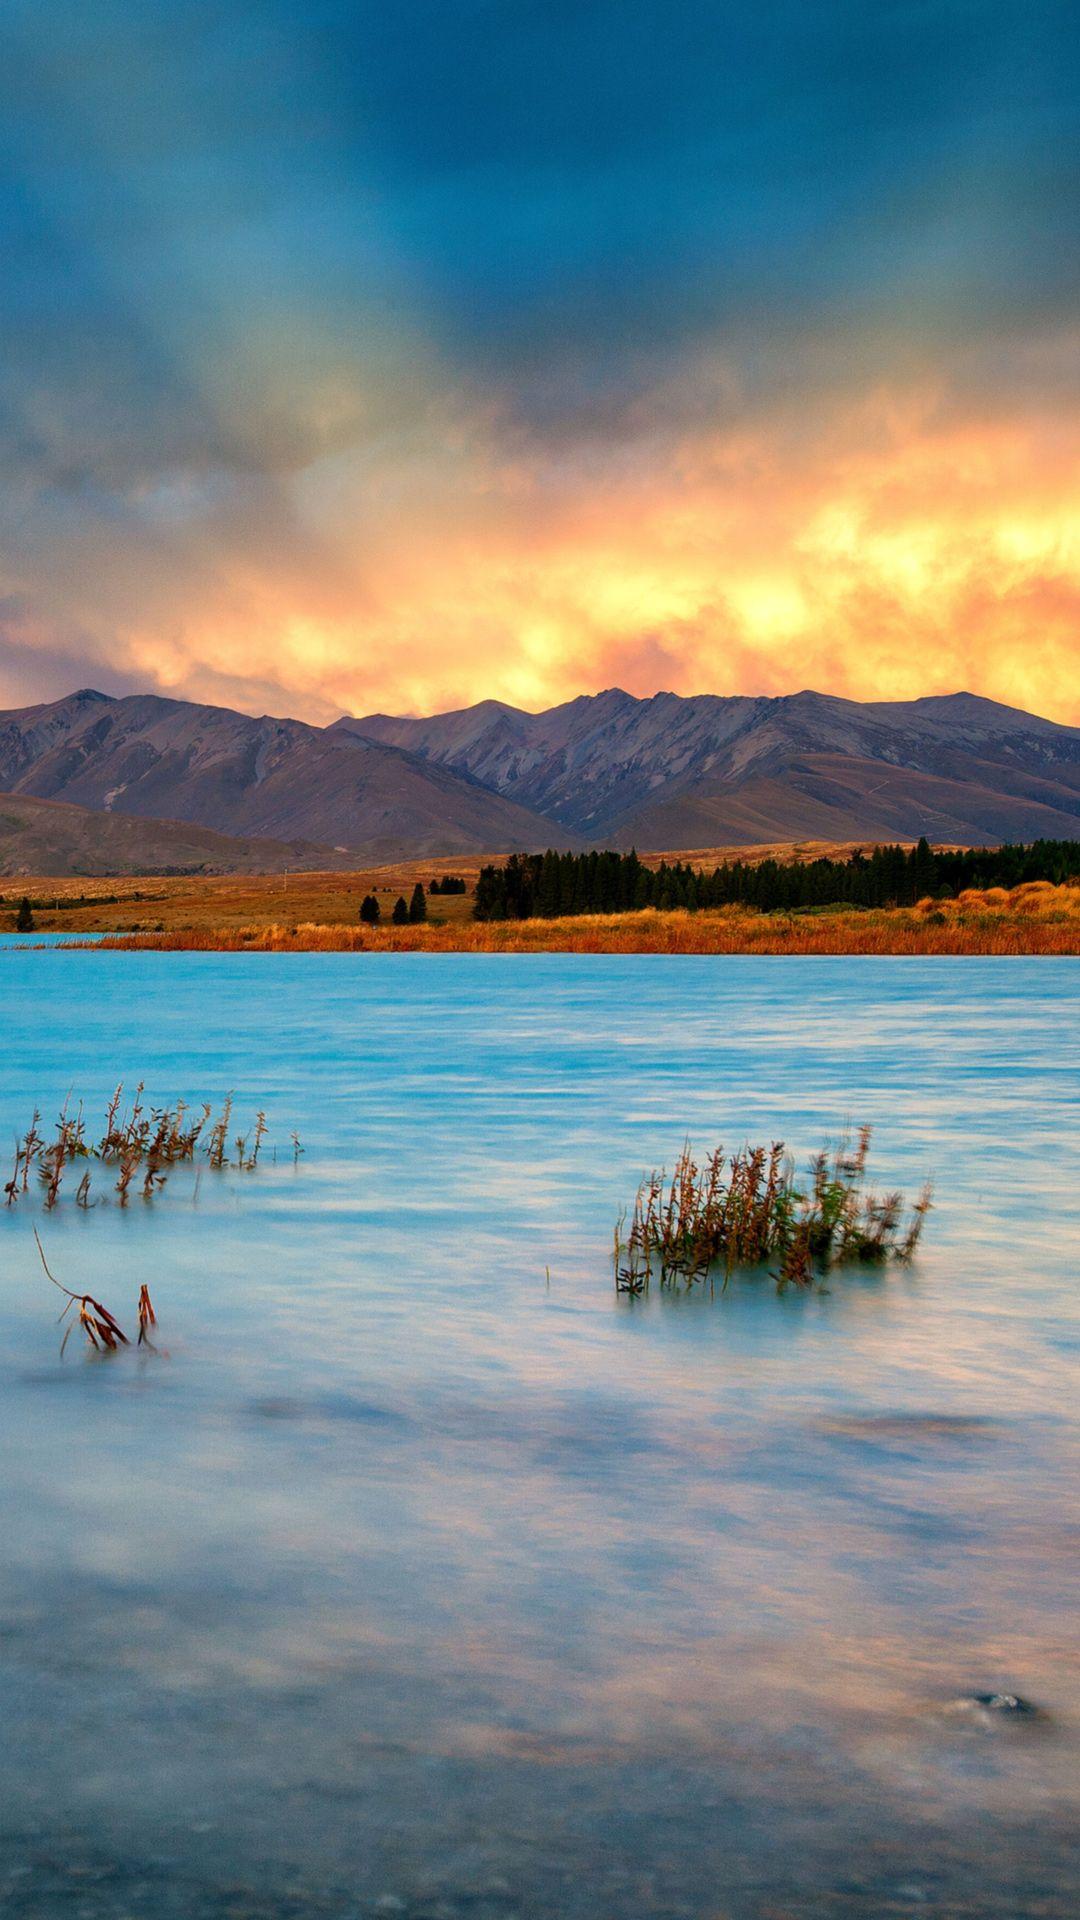 Free Magic Sunset Nature Landscape Mountain Sea Clouds Desktop Wallpaper Free Iphone Mobiles Hd Wallpapers Images Sunset Nature Landscape Desktop Wallpaper